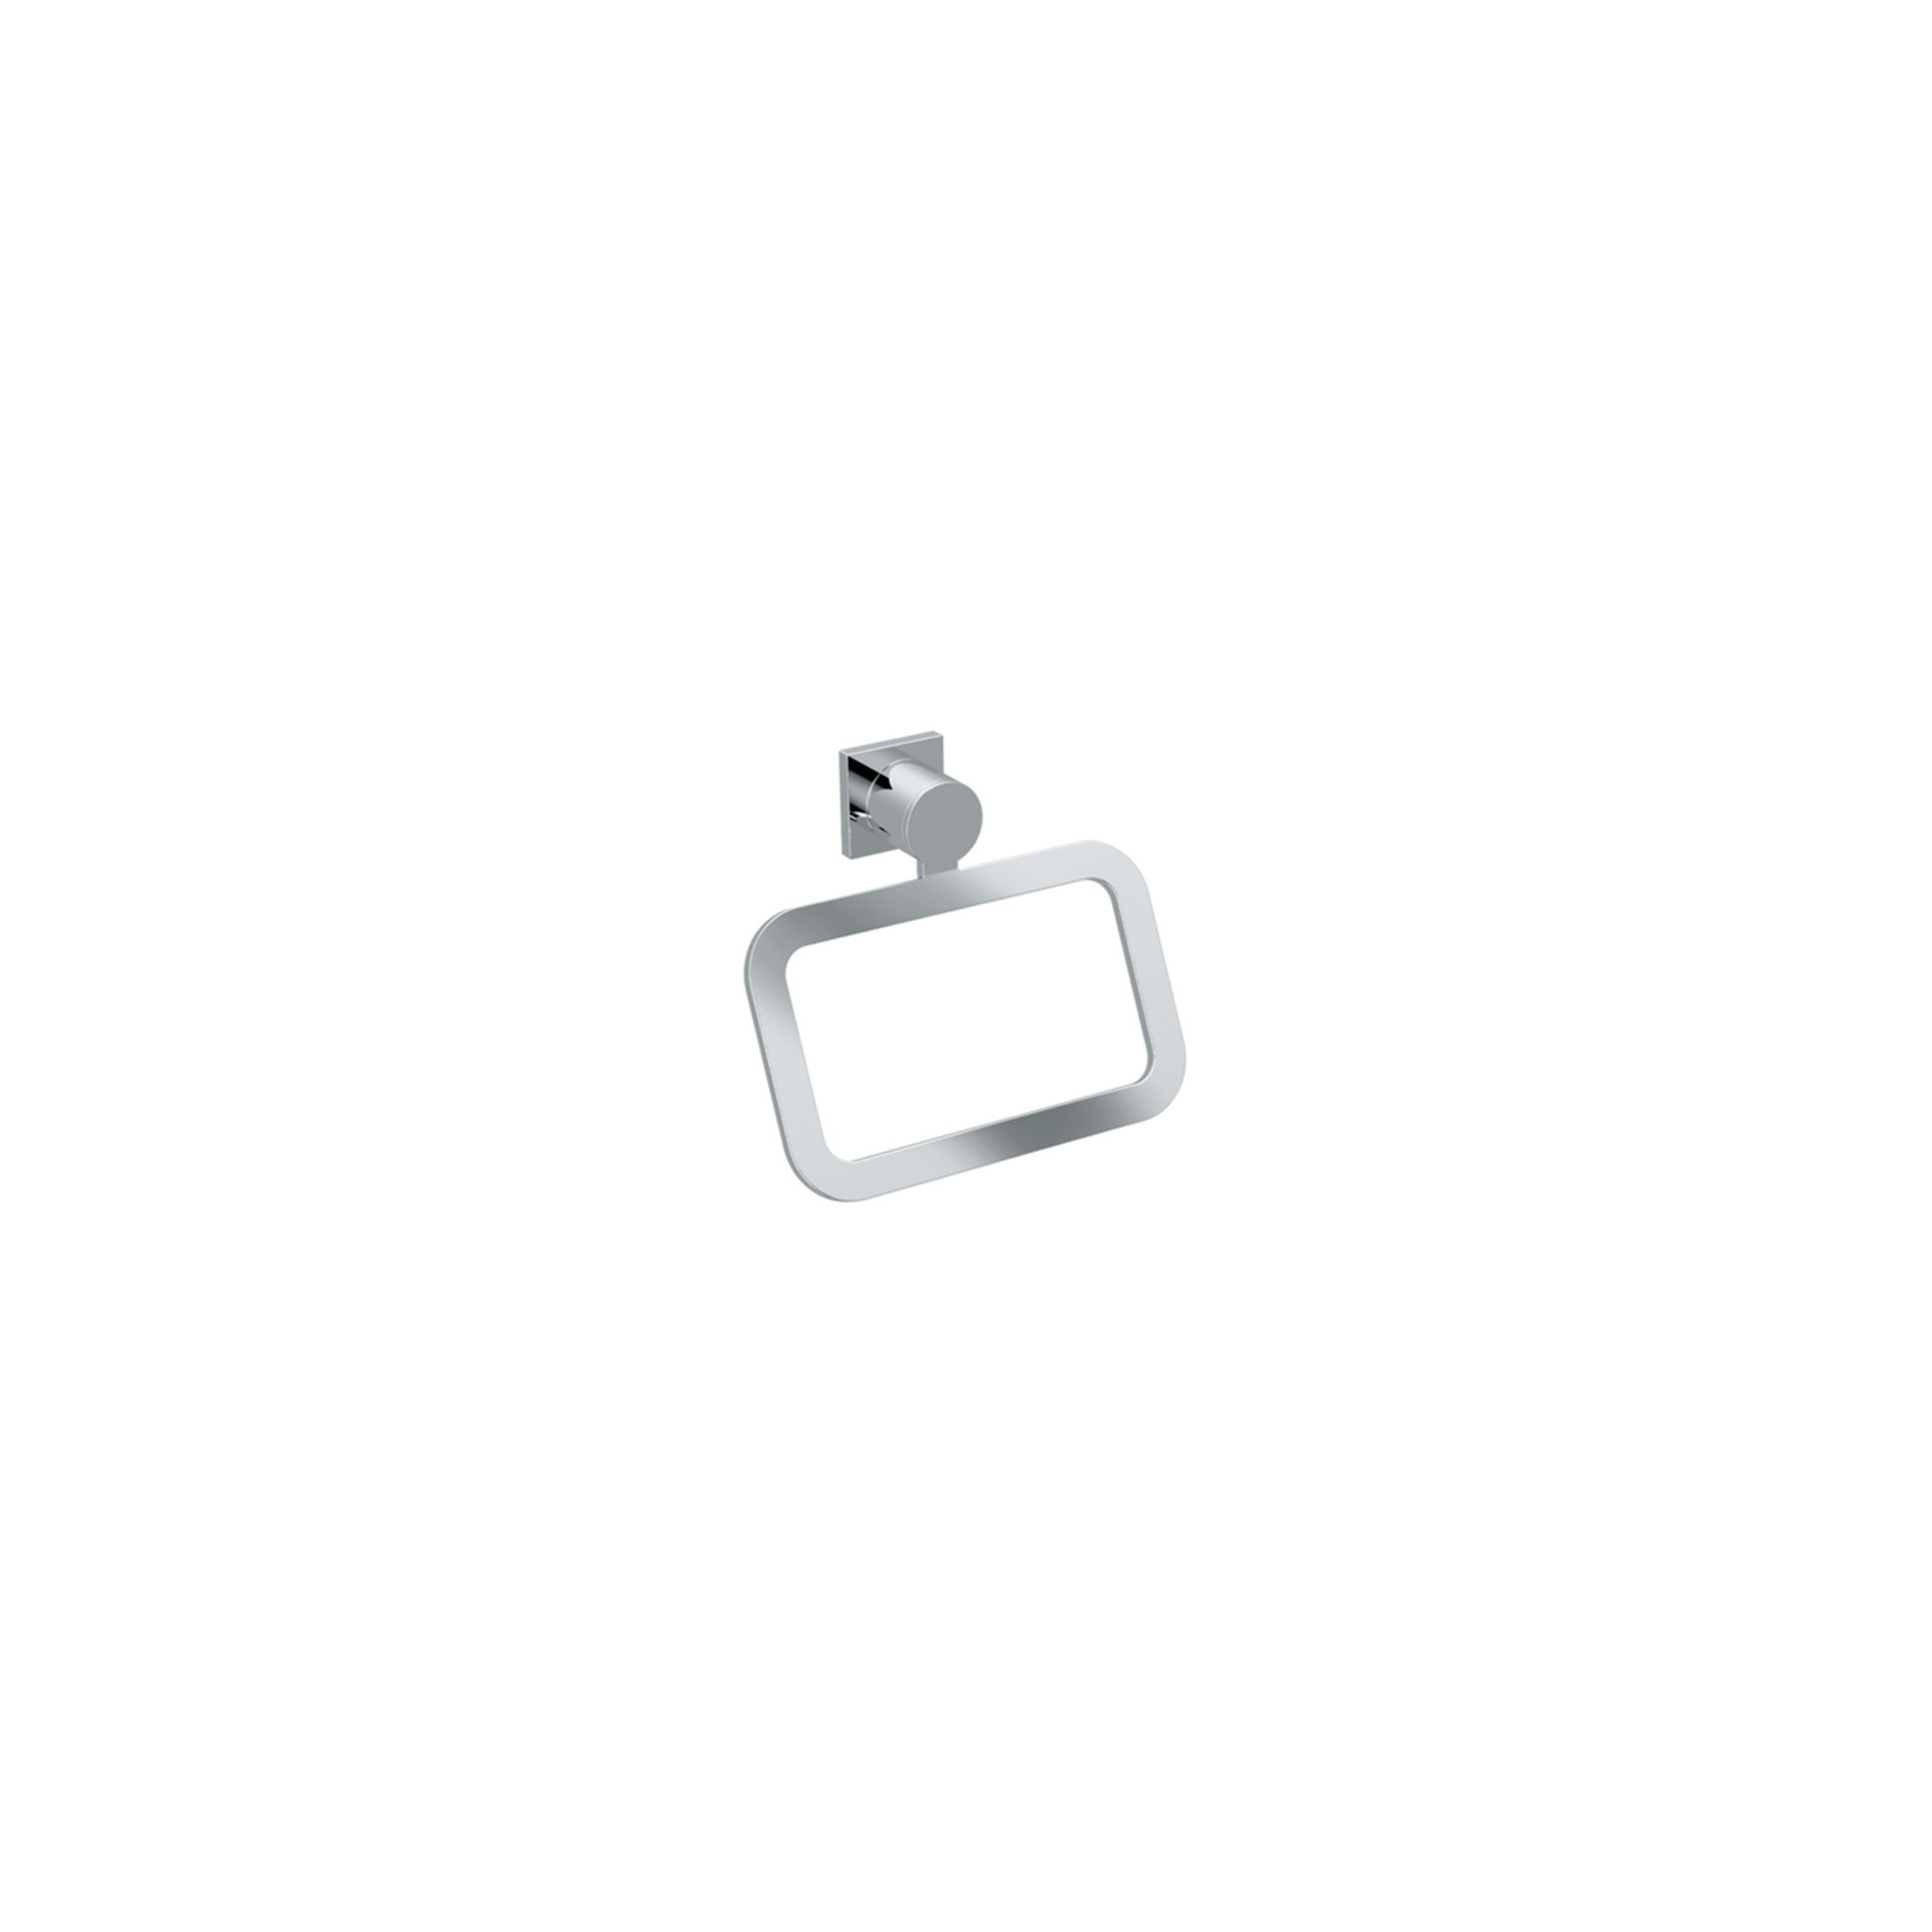 STICKER CHAMBERY SAVOIE 73 LNH DIVISION 1 HANDBALL SPORT AUTOCOLLANT 9cm HB075